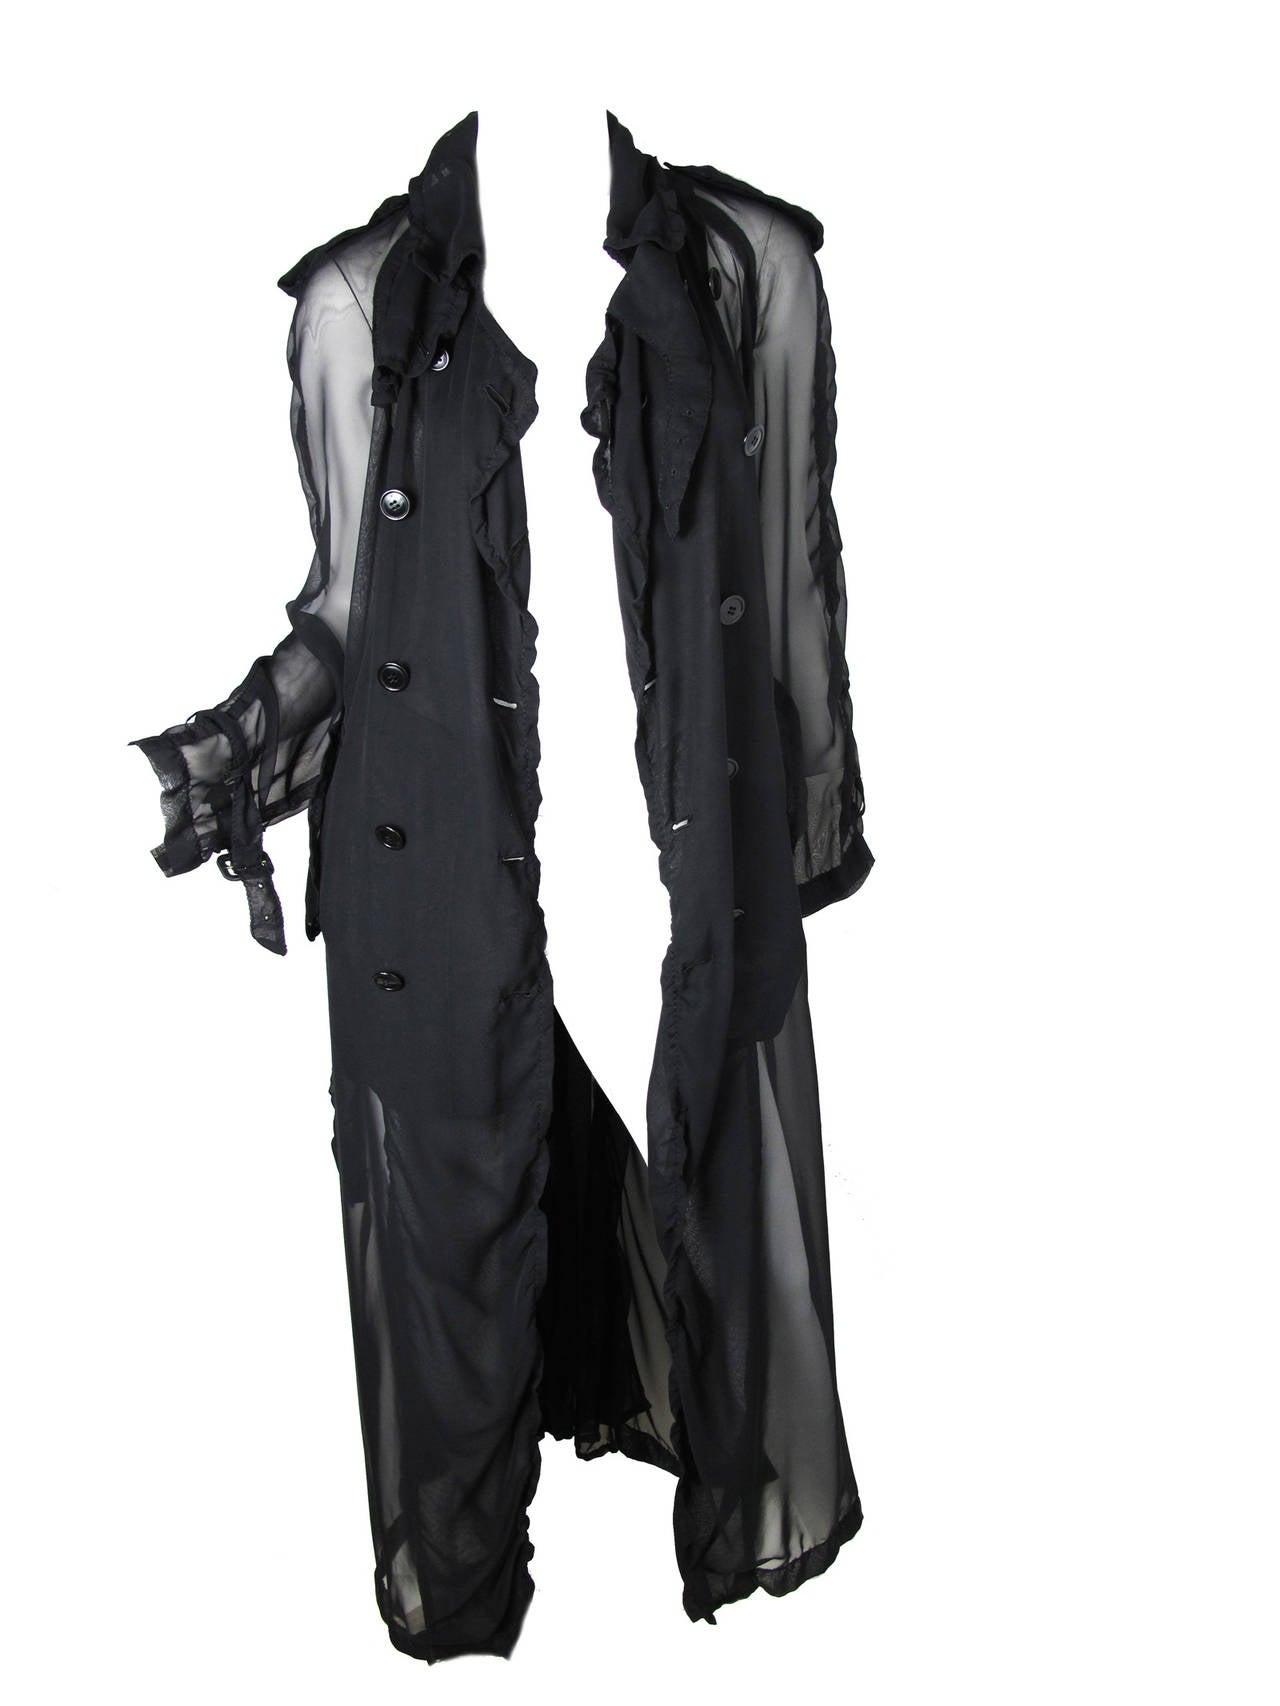 2009 Comme des Garcons Sheer Trench Coat 4